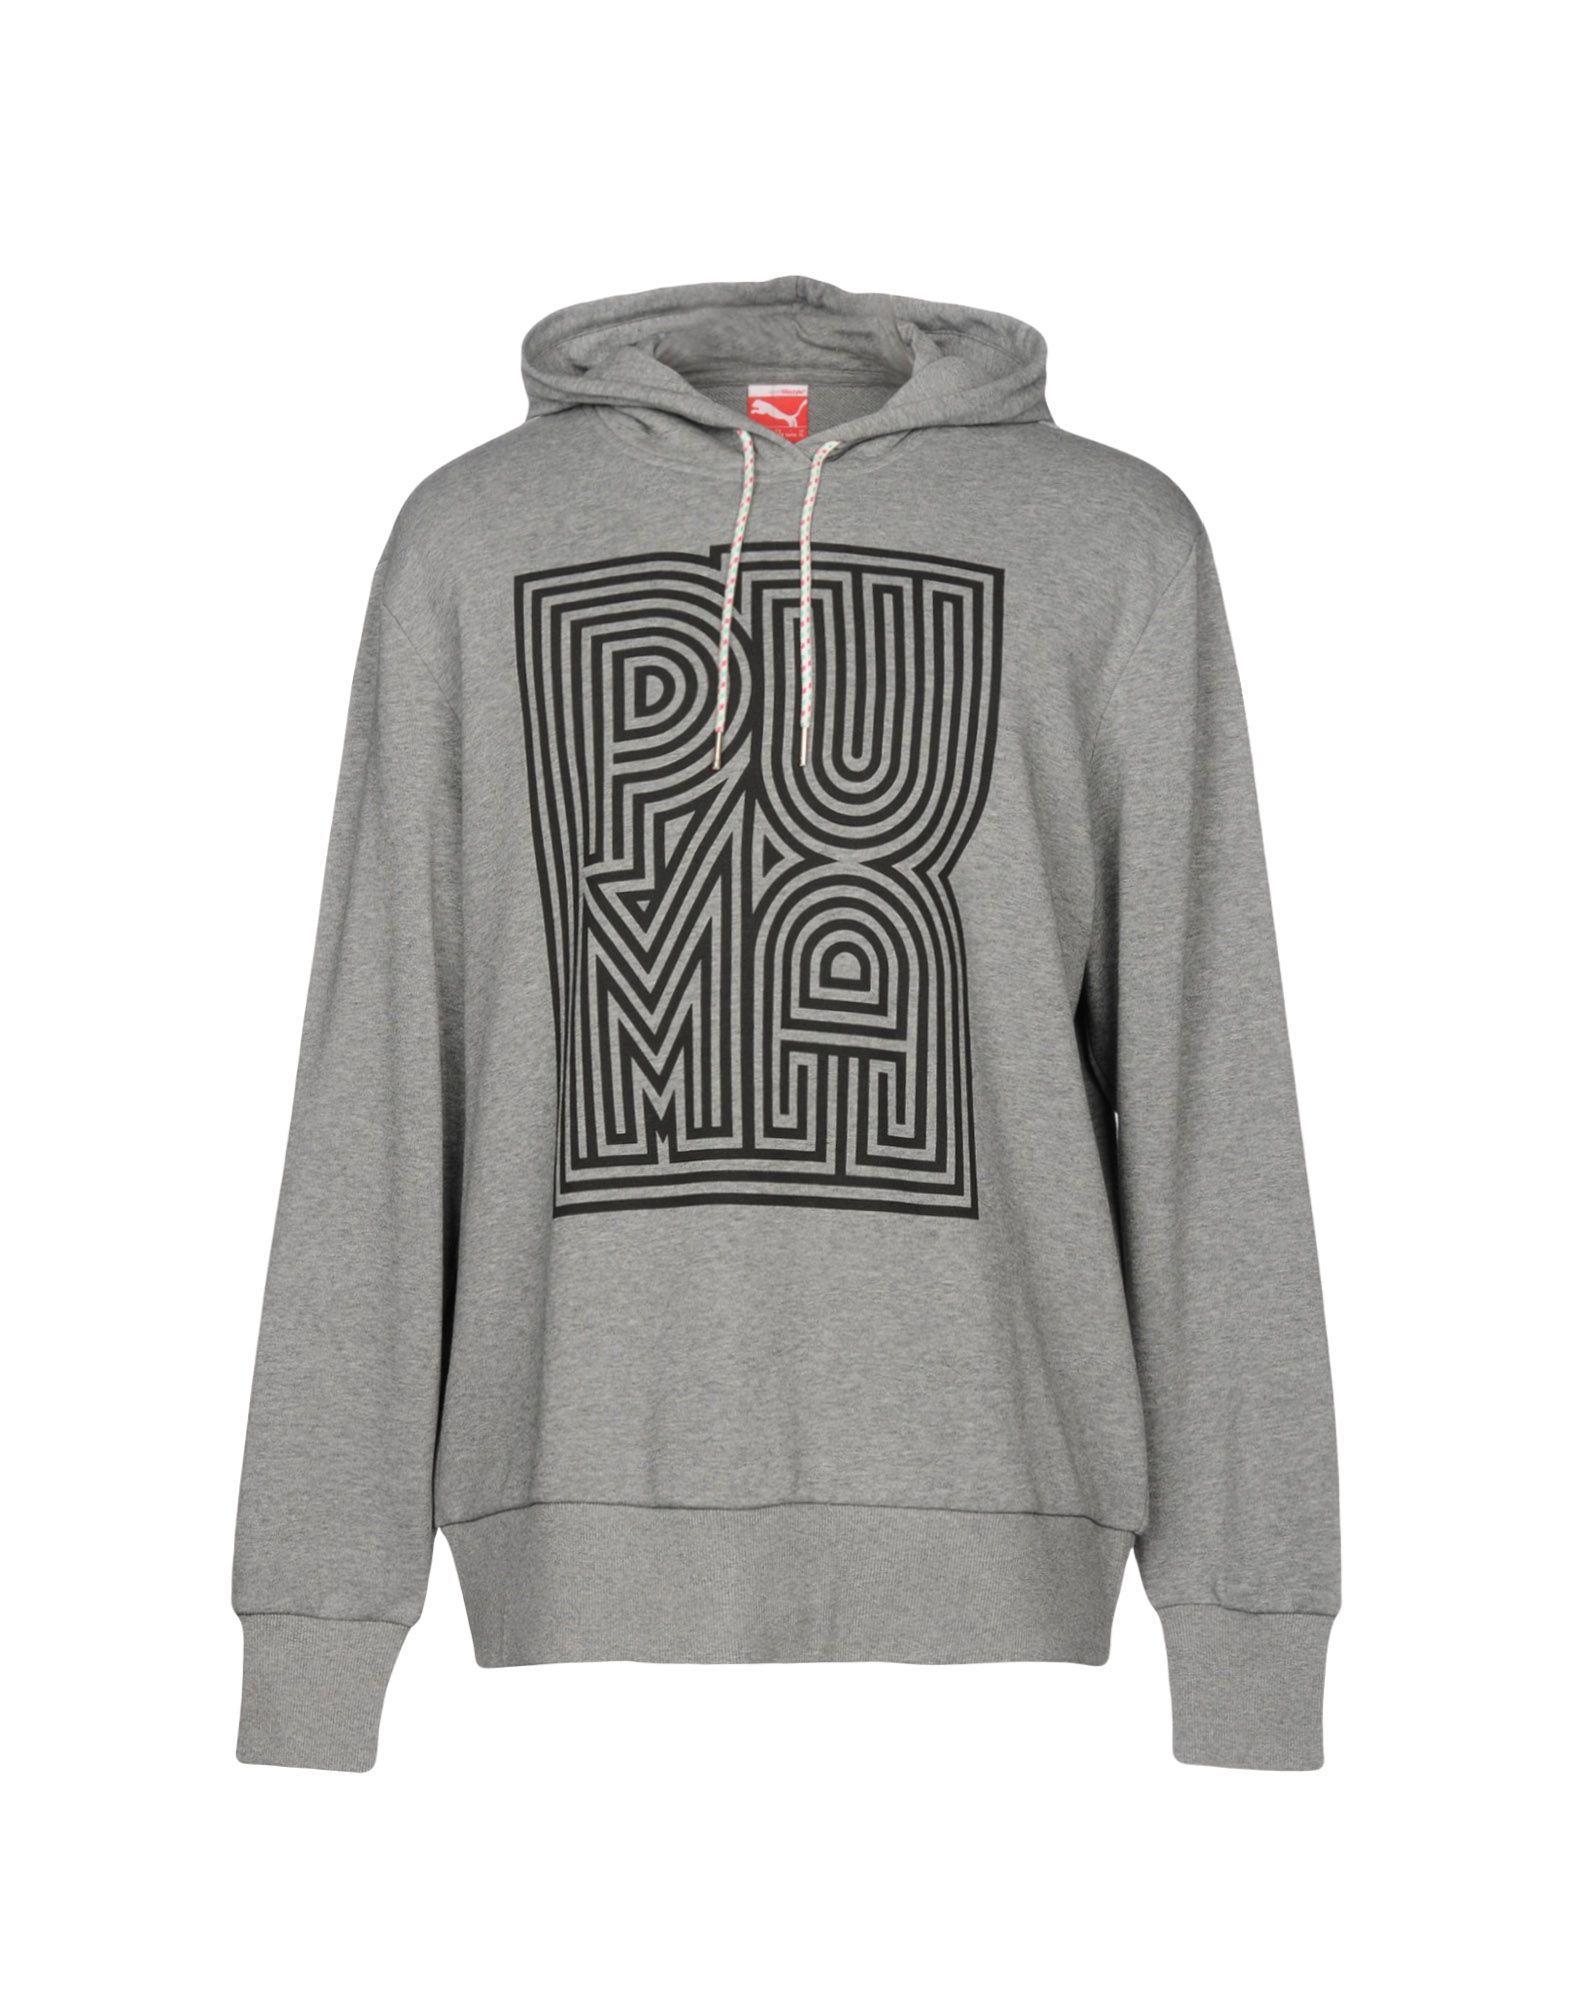 ac629aafe8 Puma Hooded Sweatshirt - Men Puma Hooded Sweatshirts online on YOOX United  States - 12154683KW